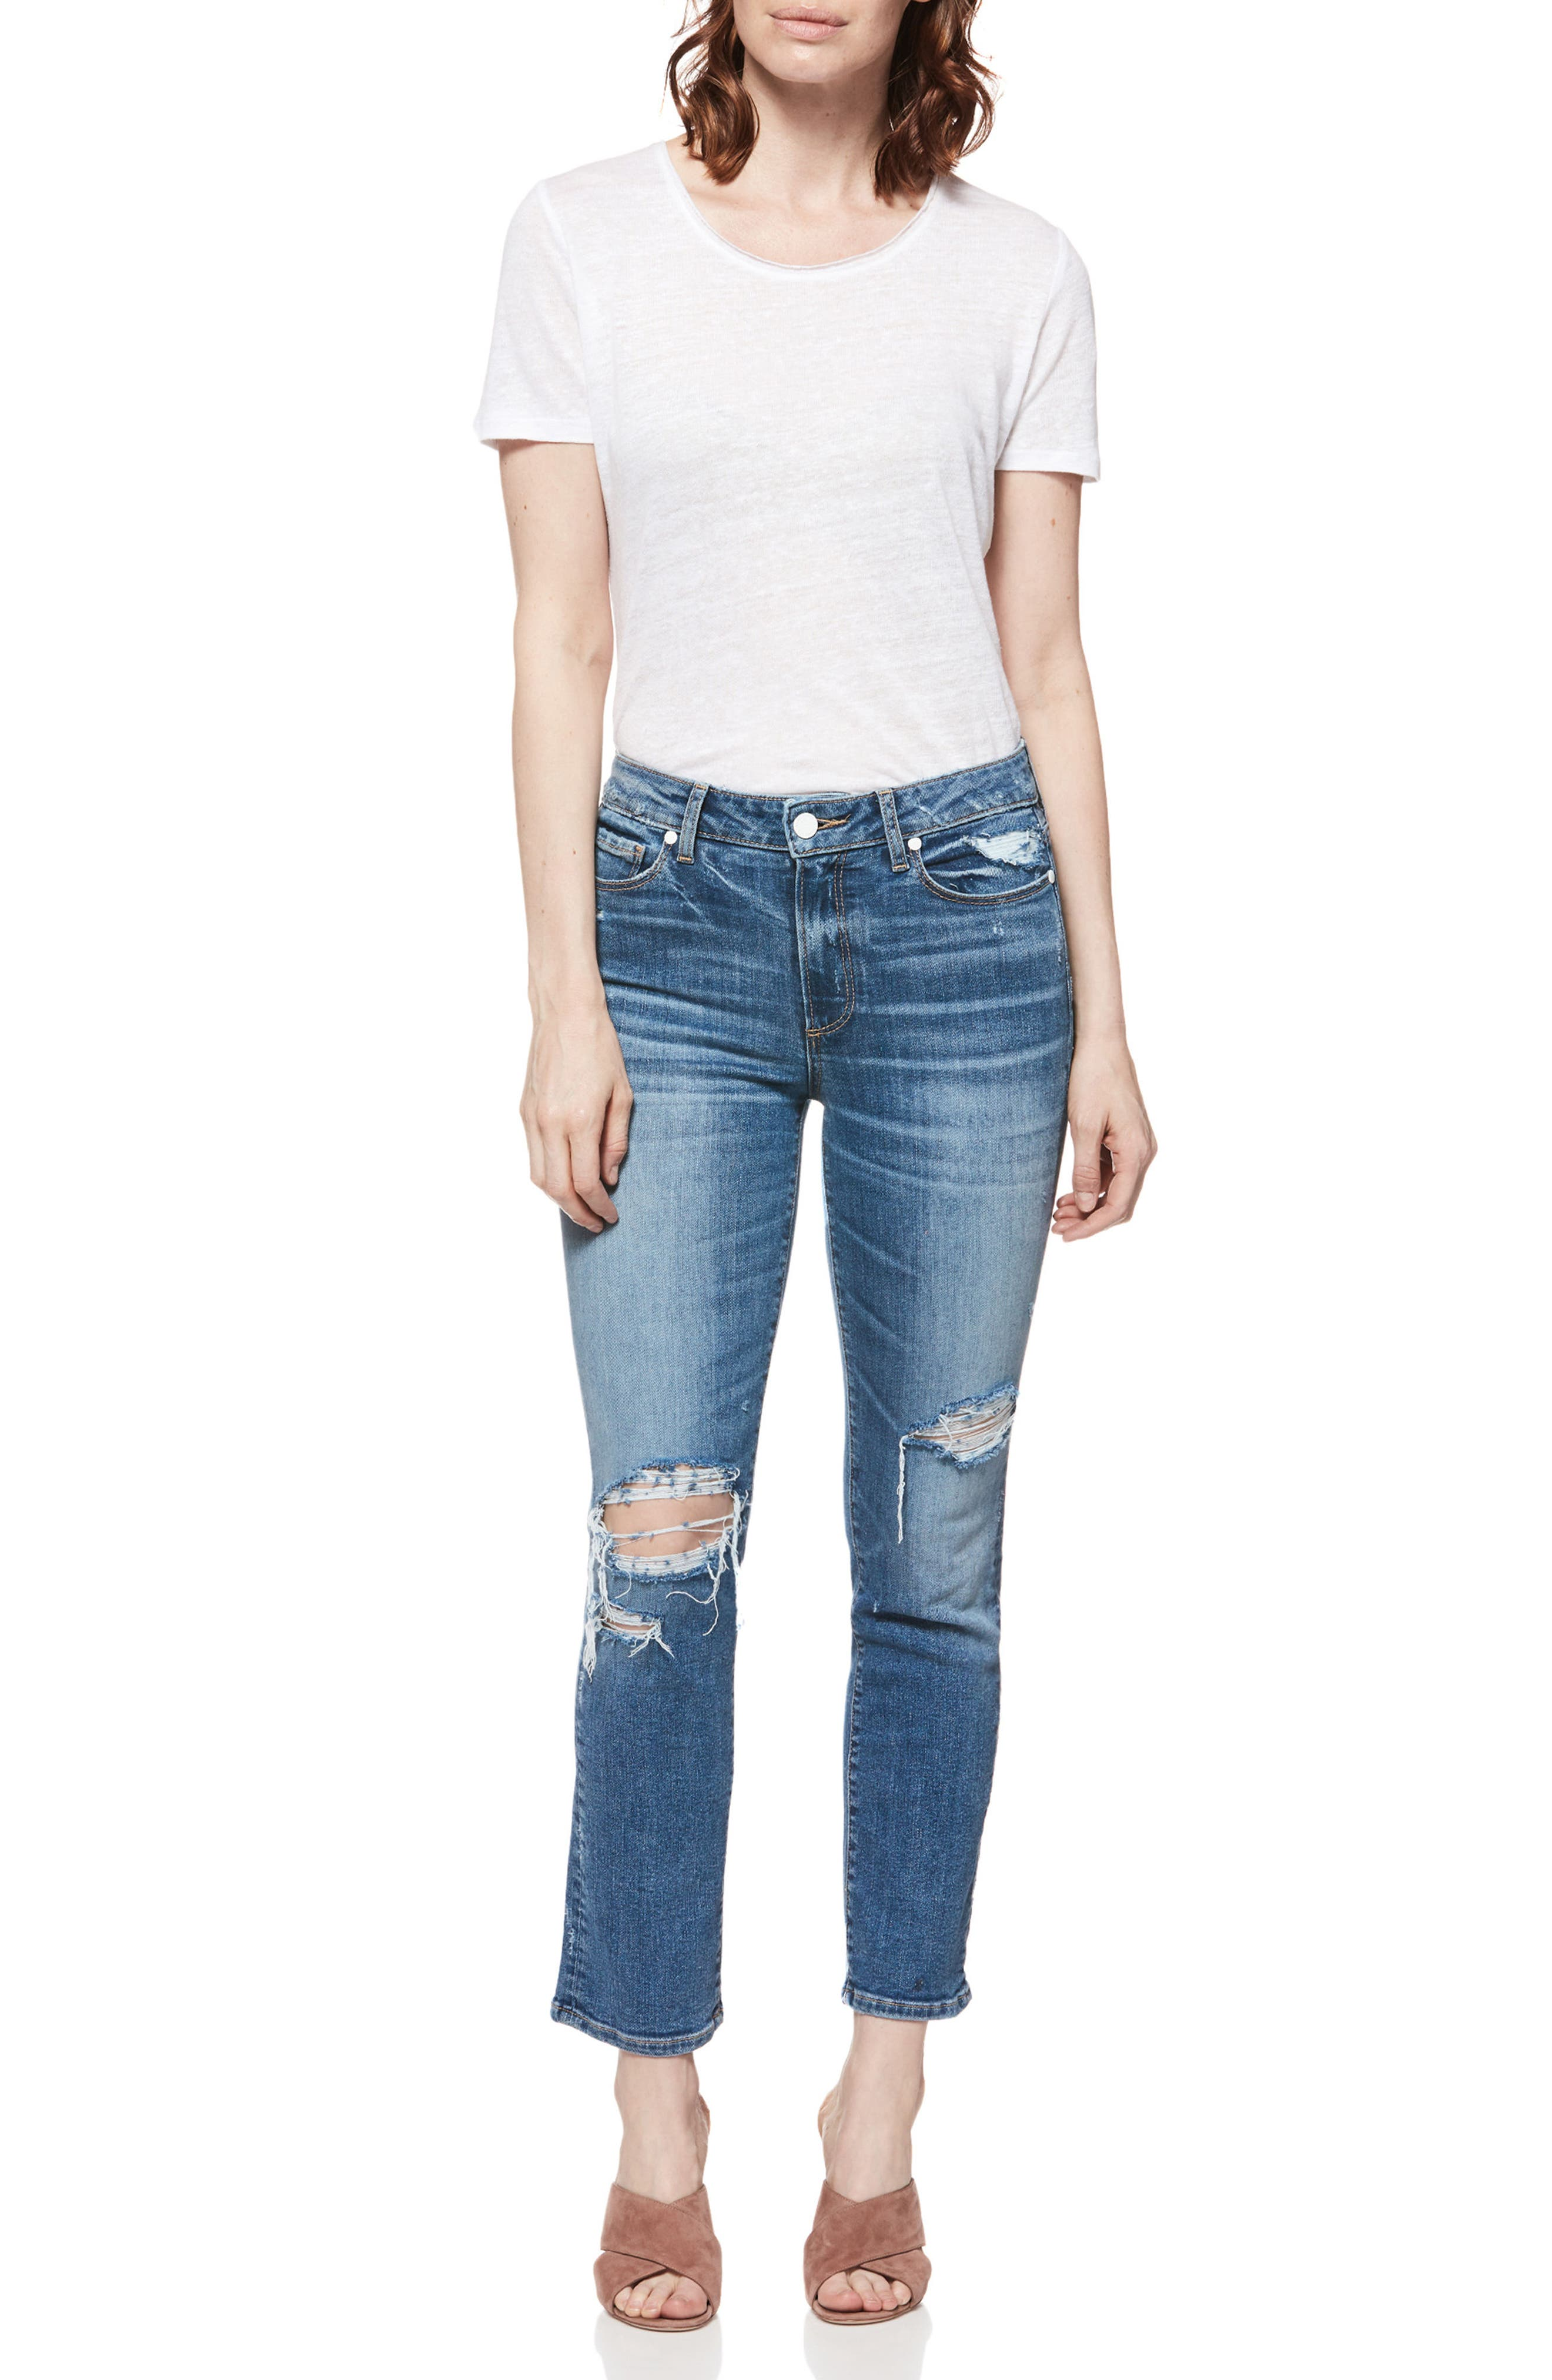 PAIGE, Verdugo Transcend Vintage Ripped Ankle Skinny Jeans, Alternate thumbnail 5, color, EMBARCADERO DESTRUCTED